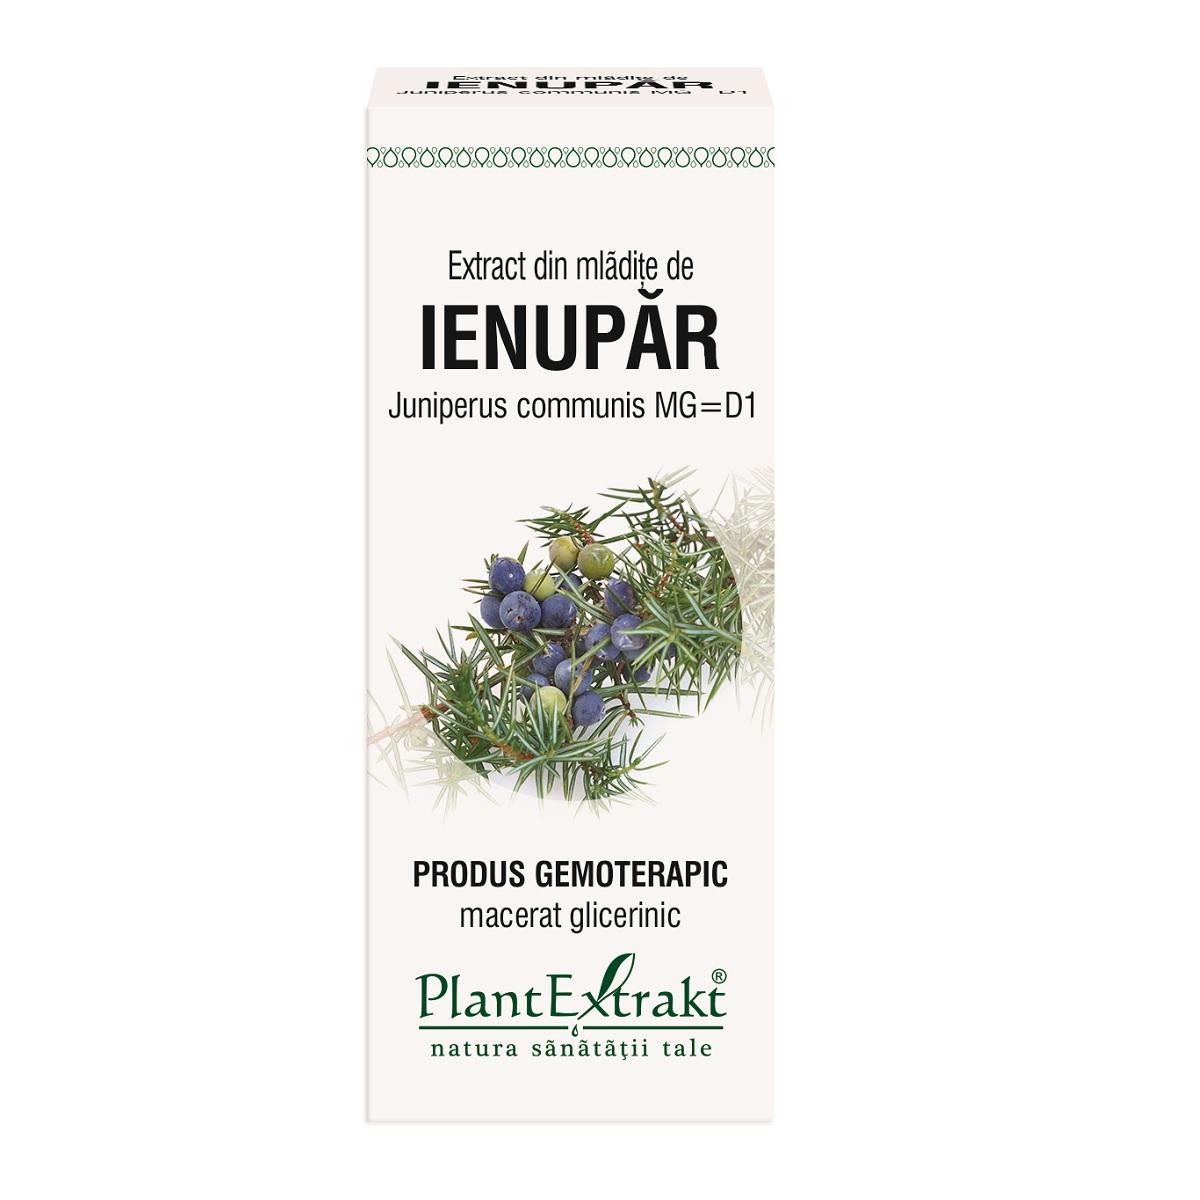 Extract din mlădițe de Ienupăr, 50 ml, Plant Extrakt